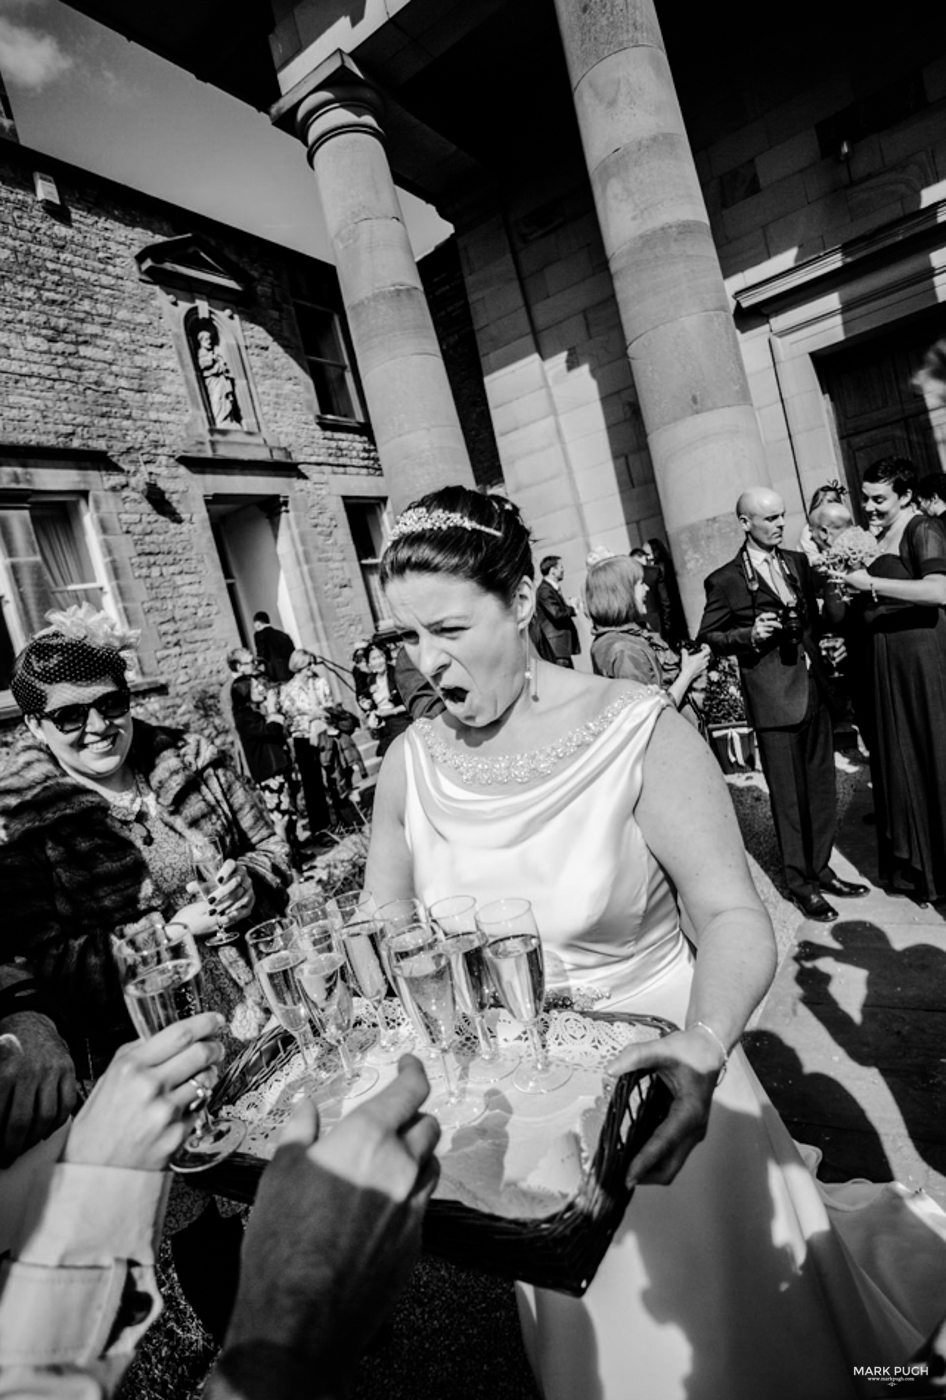 070  - Helen and Tim - Wedding Photography at Chatsworth House Bakewell Derbyshire DE45 1PP - Wedding Photographer Mark Pugh www.markpugh.com -140.JPG